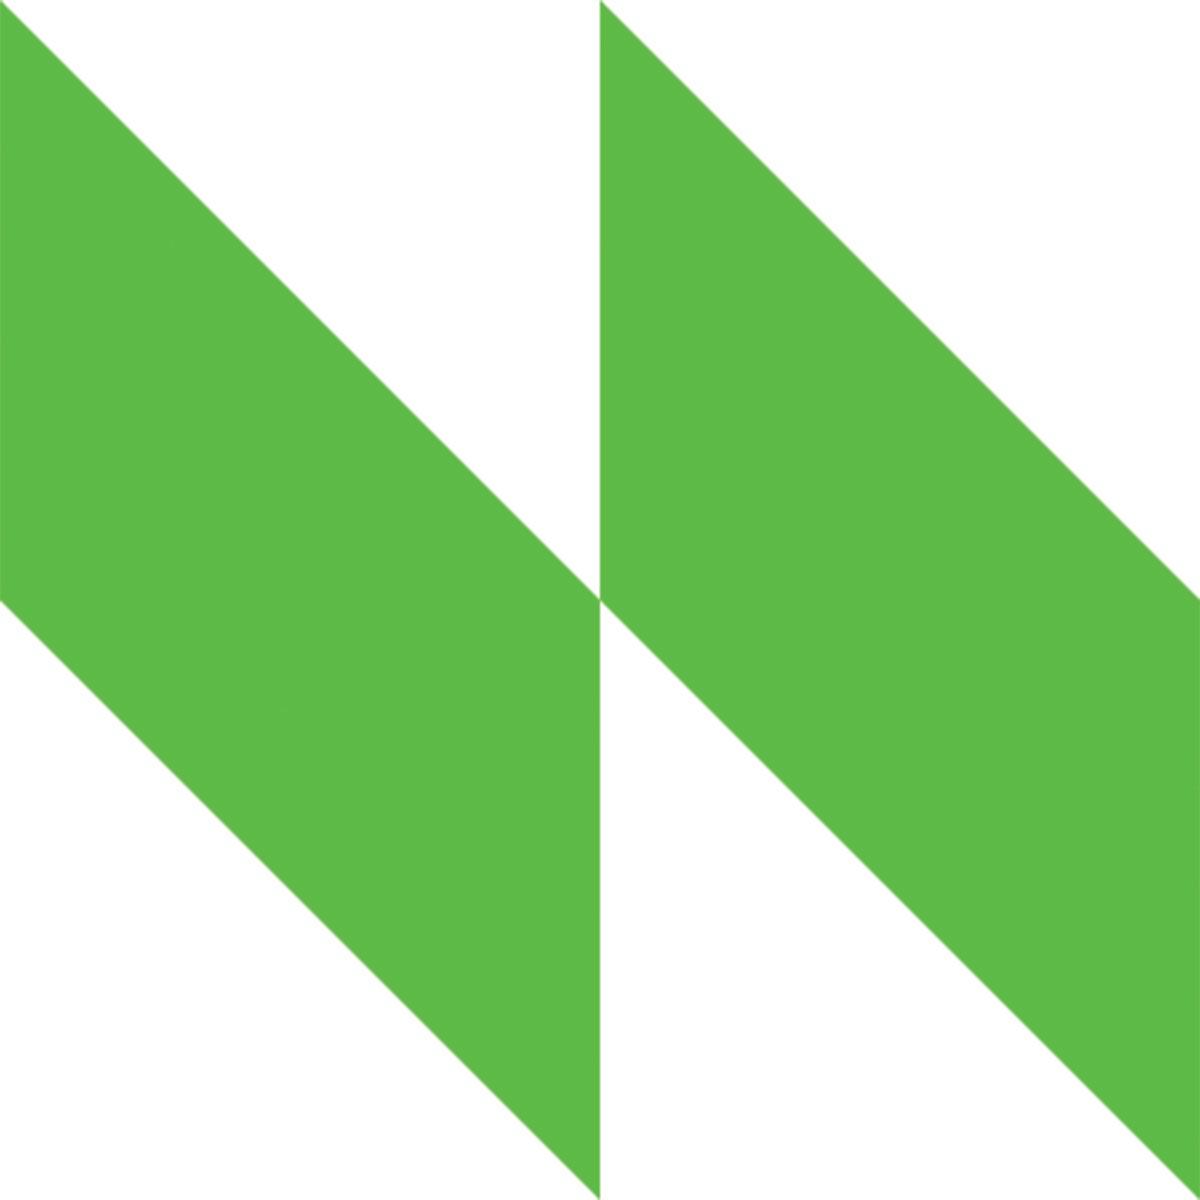 NielsenIQ Data Update Shows Flat Summer Holiday